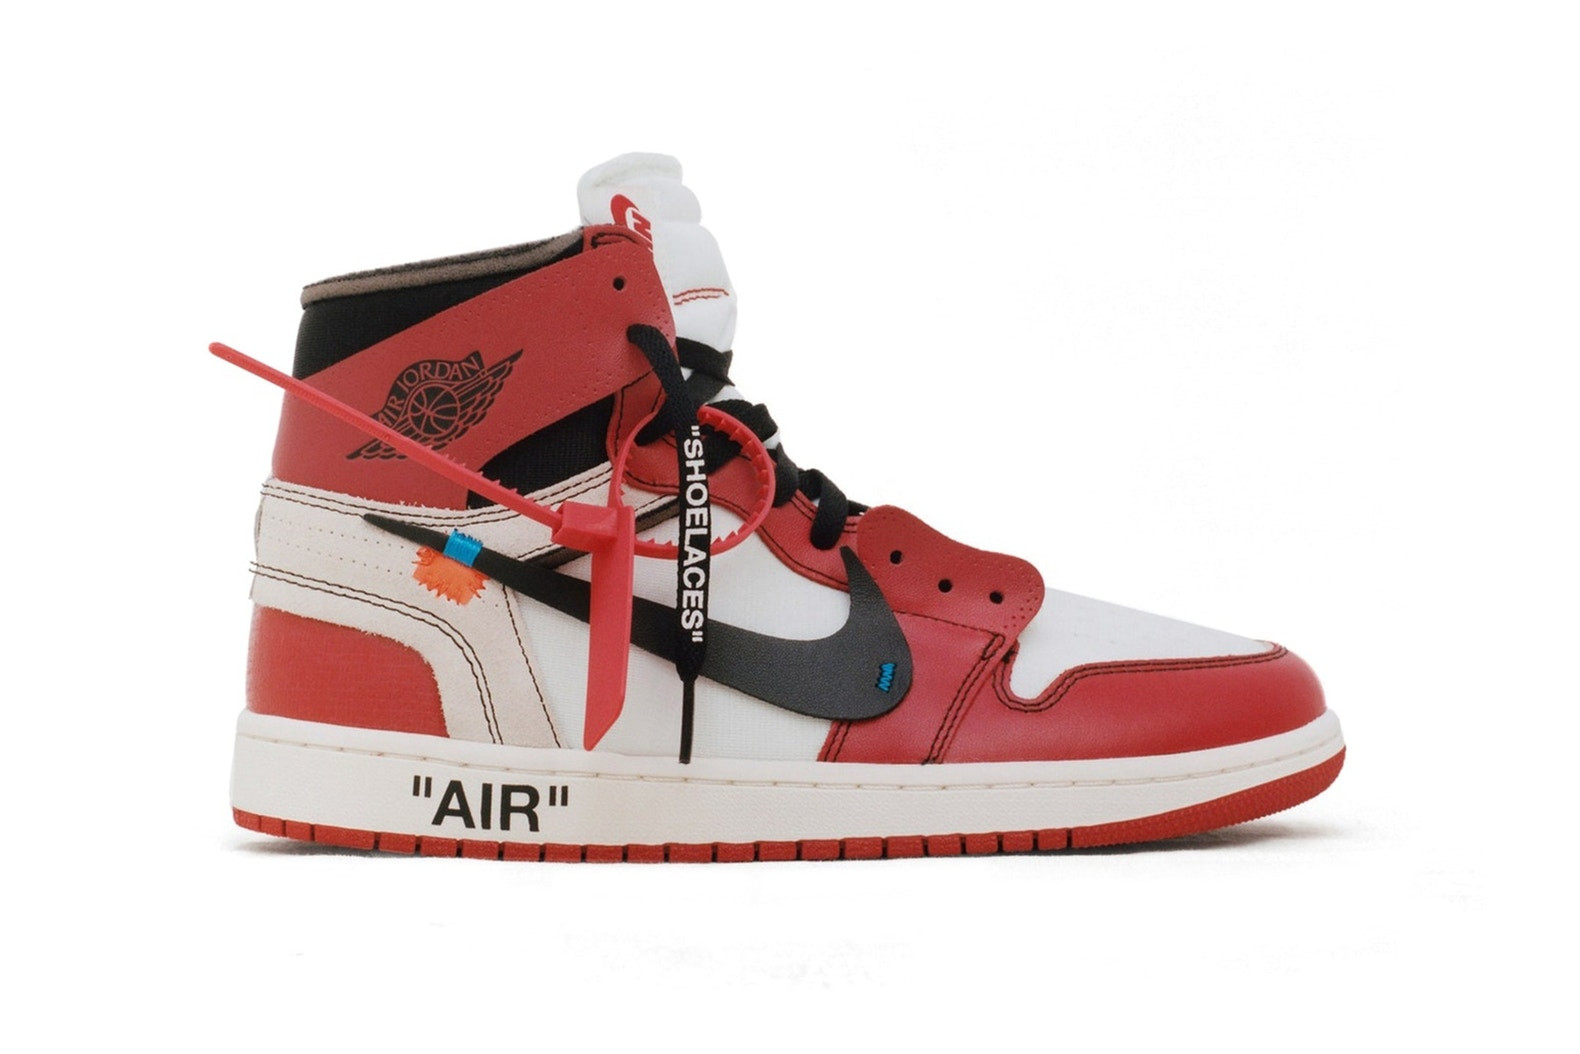 DSM London's Virgil Abloh x Nike Raffle